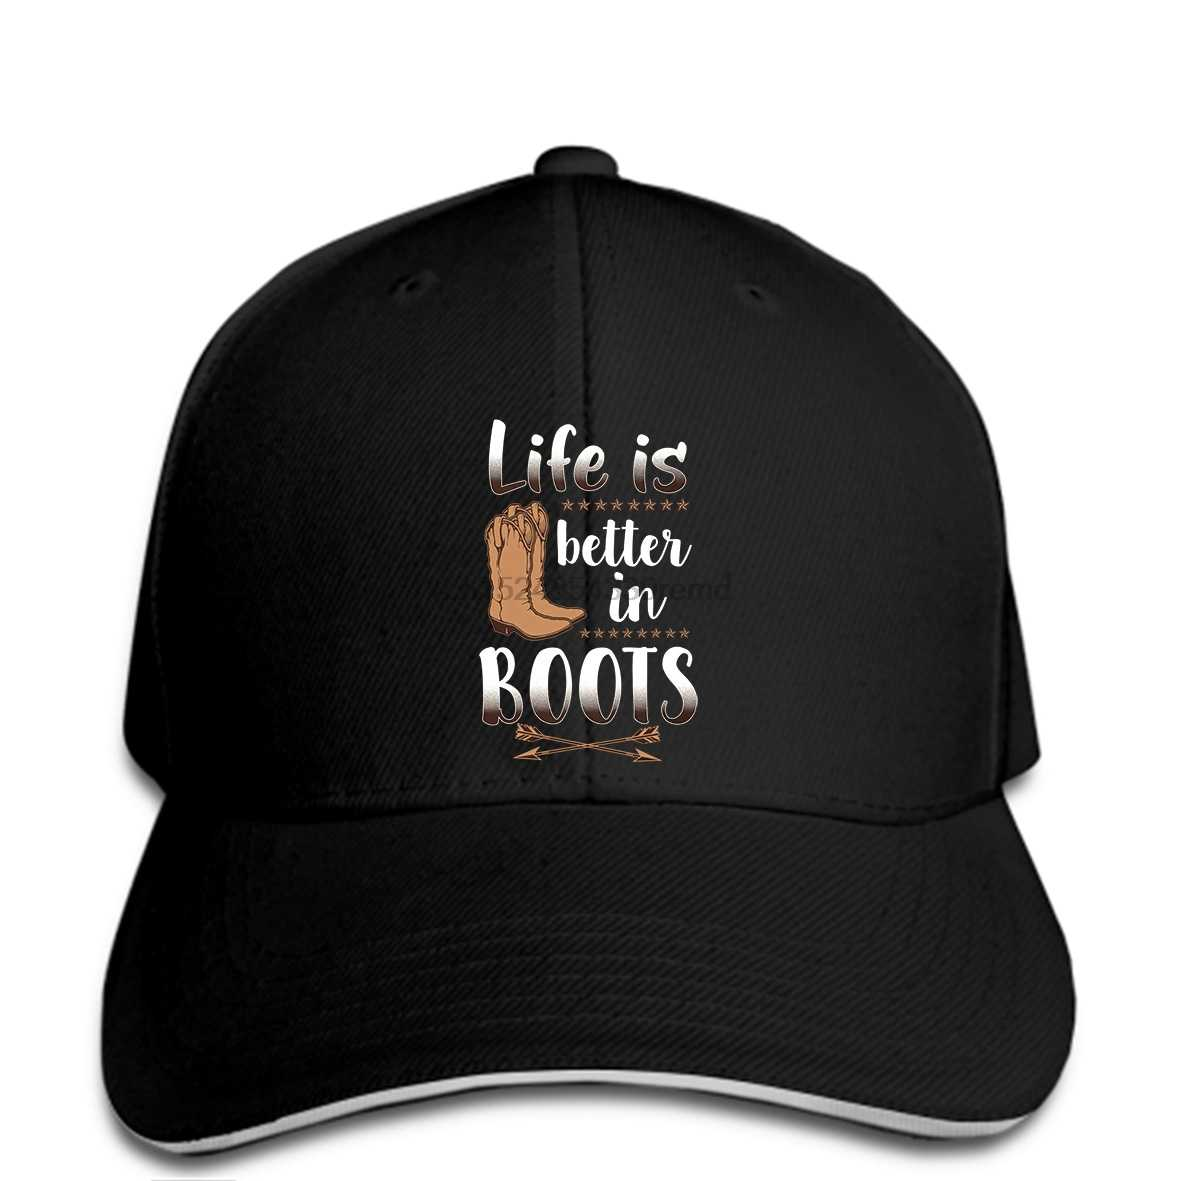 9d07d8a7b Detail Feedback Questions about hip hop Baseball caps Funny Men hat ...